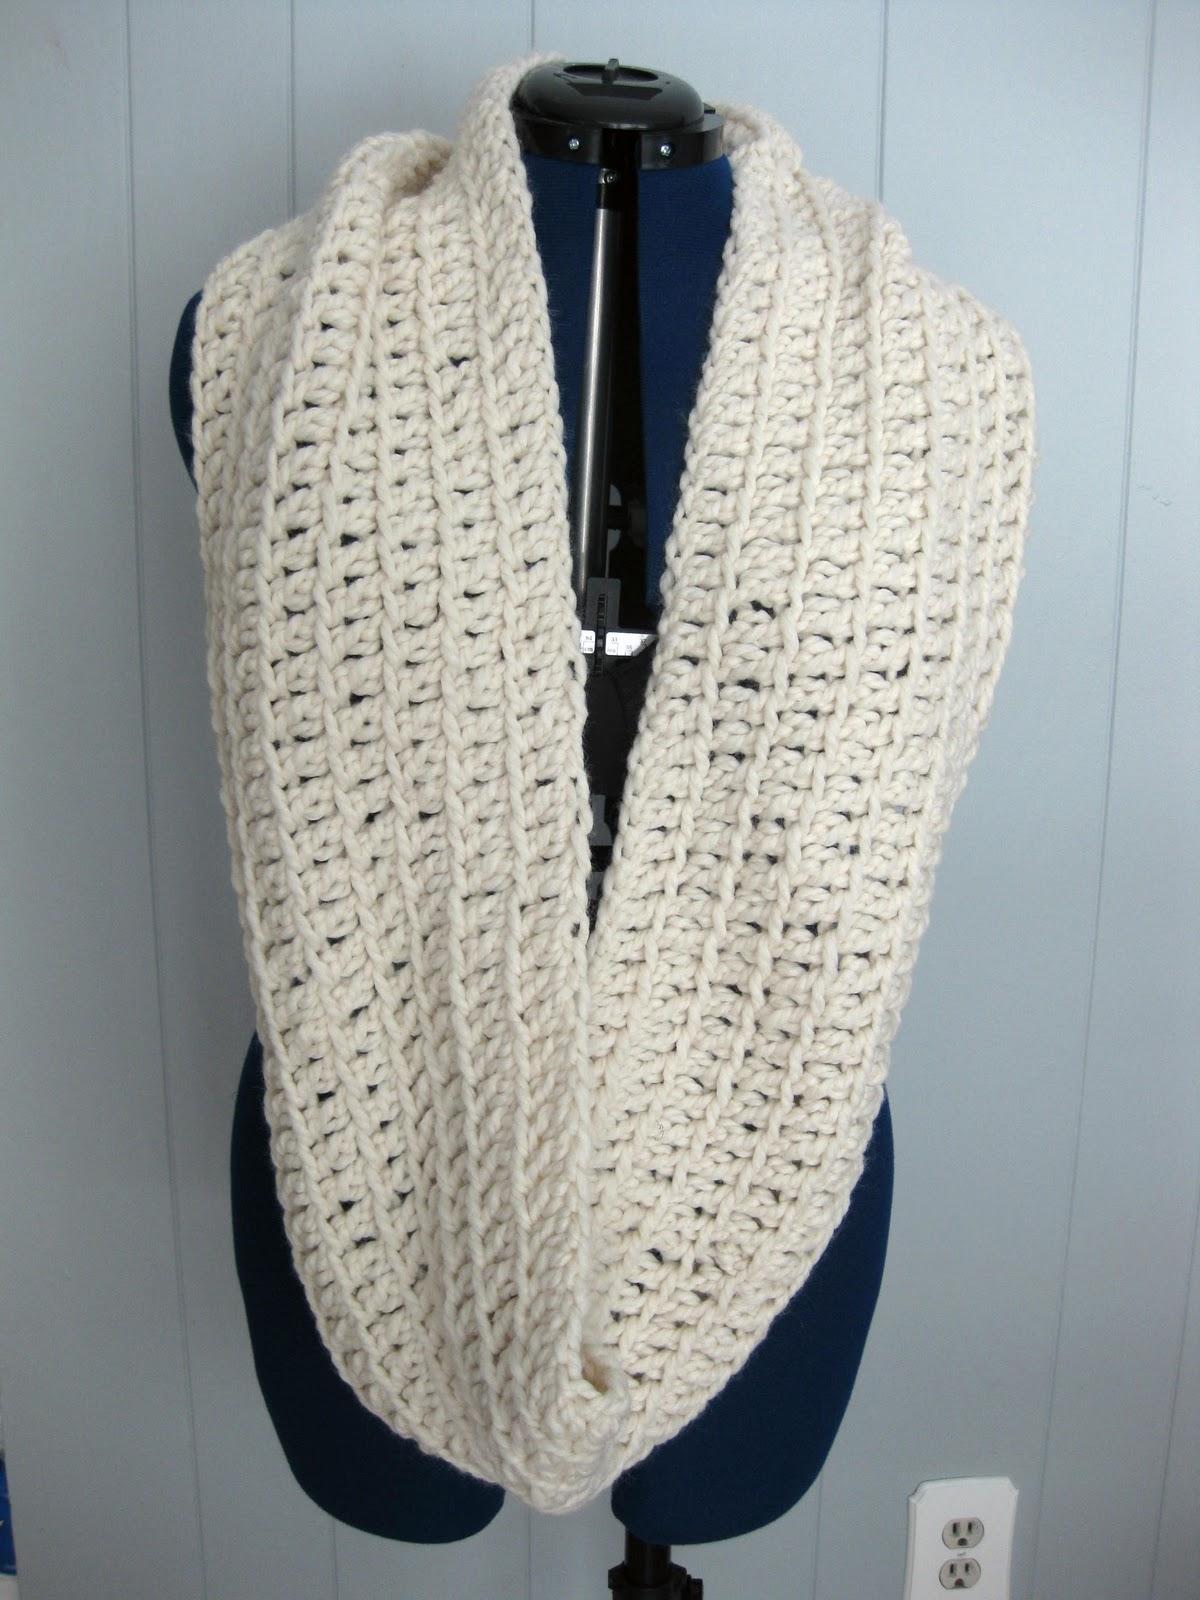 Gap Infinity Scarf Knitting Pattern : SEWmuchKNITting: Gap-inspired Infinity scarves